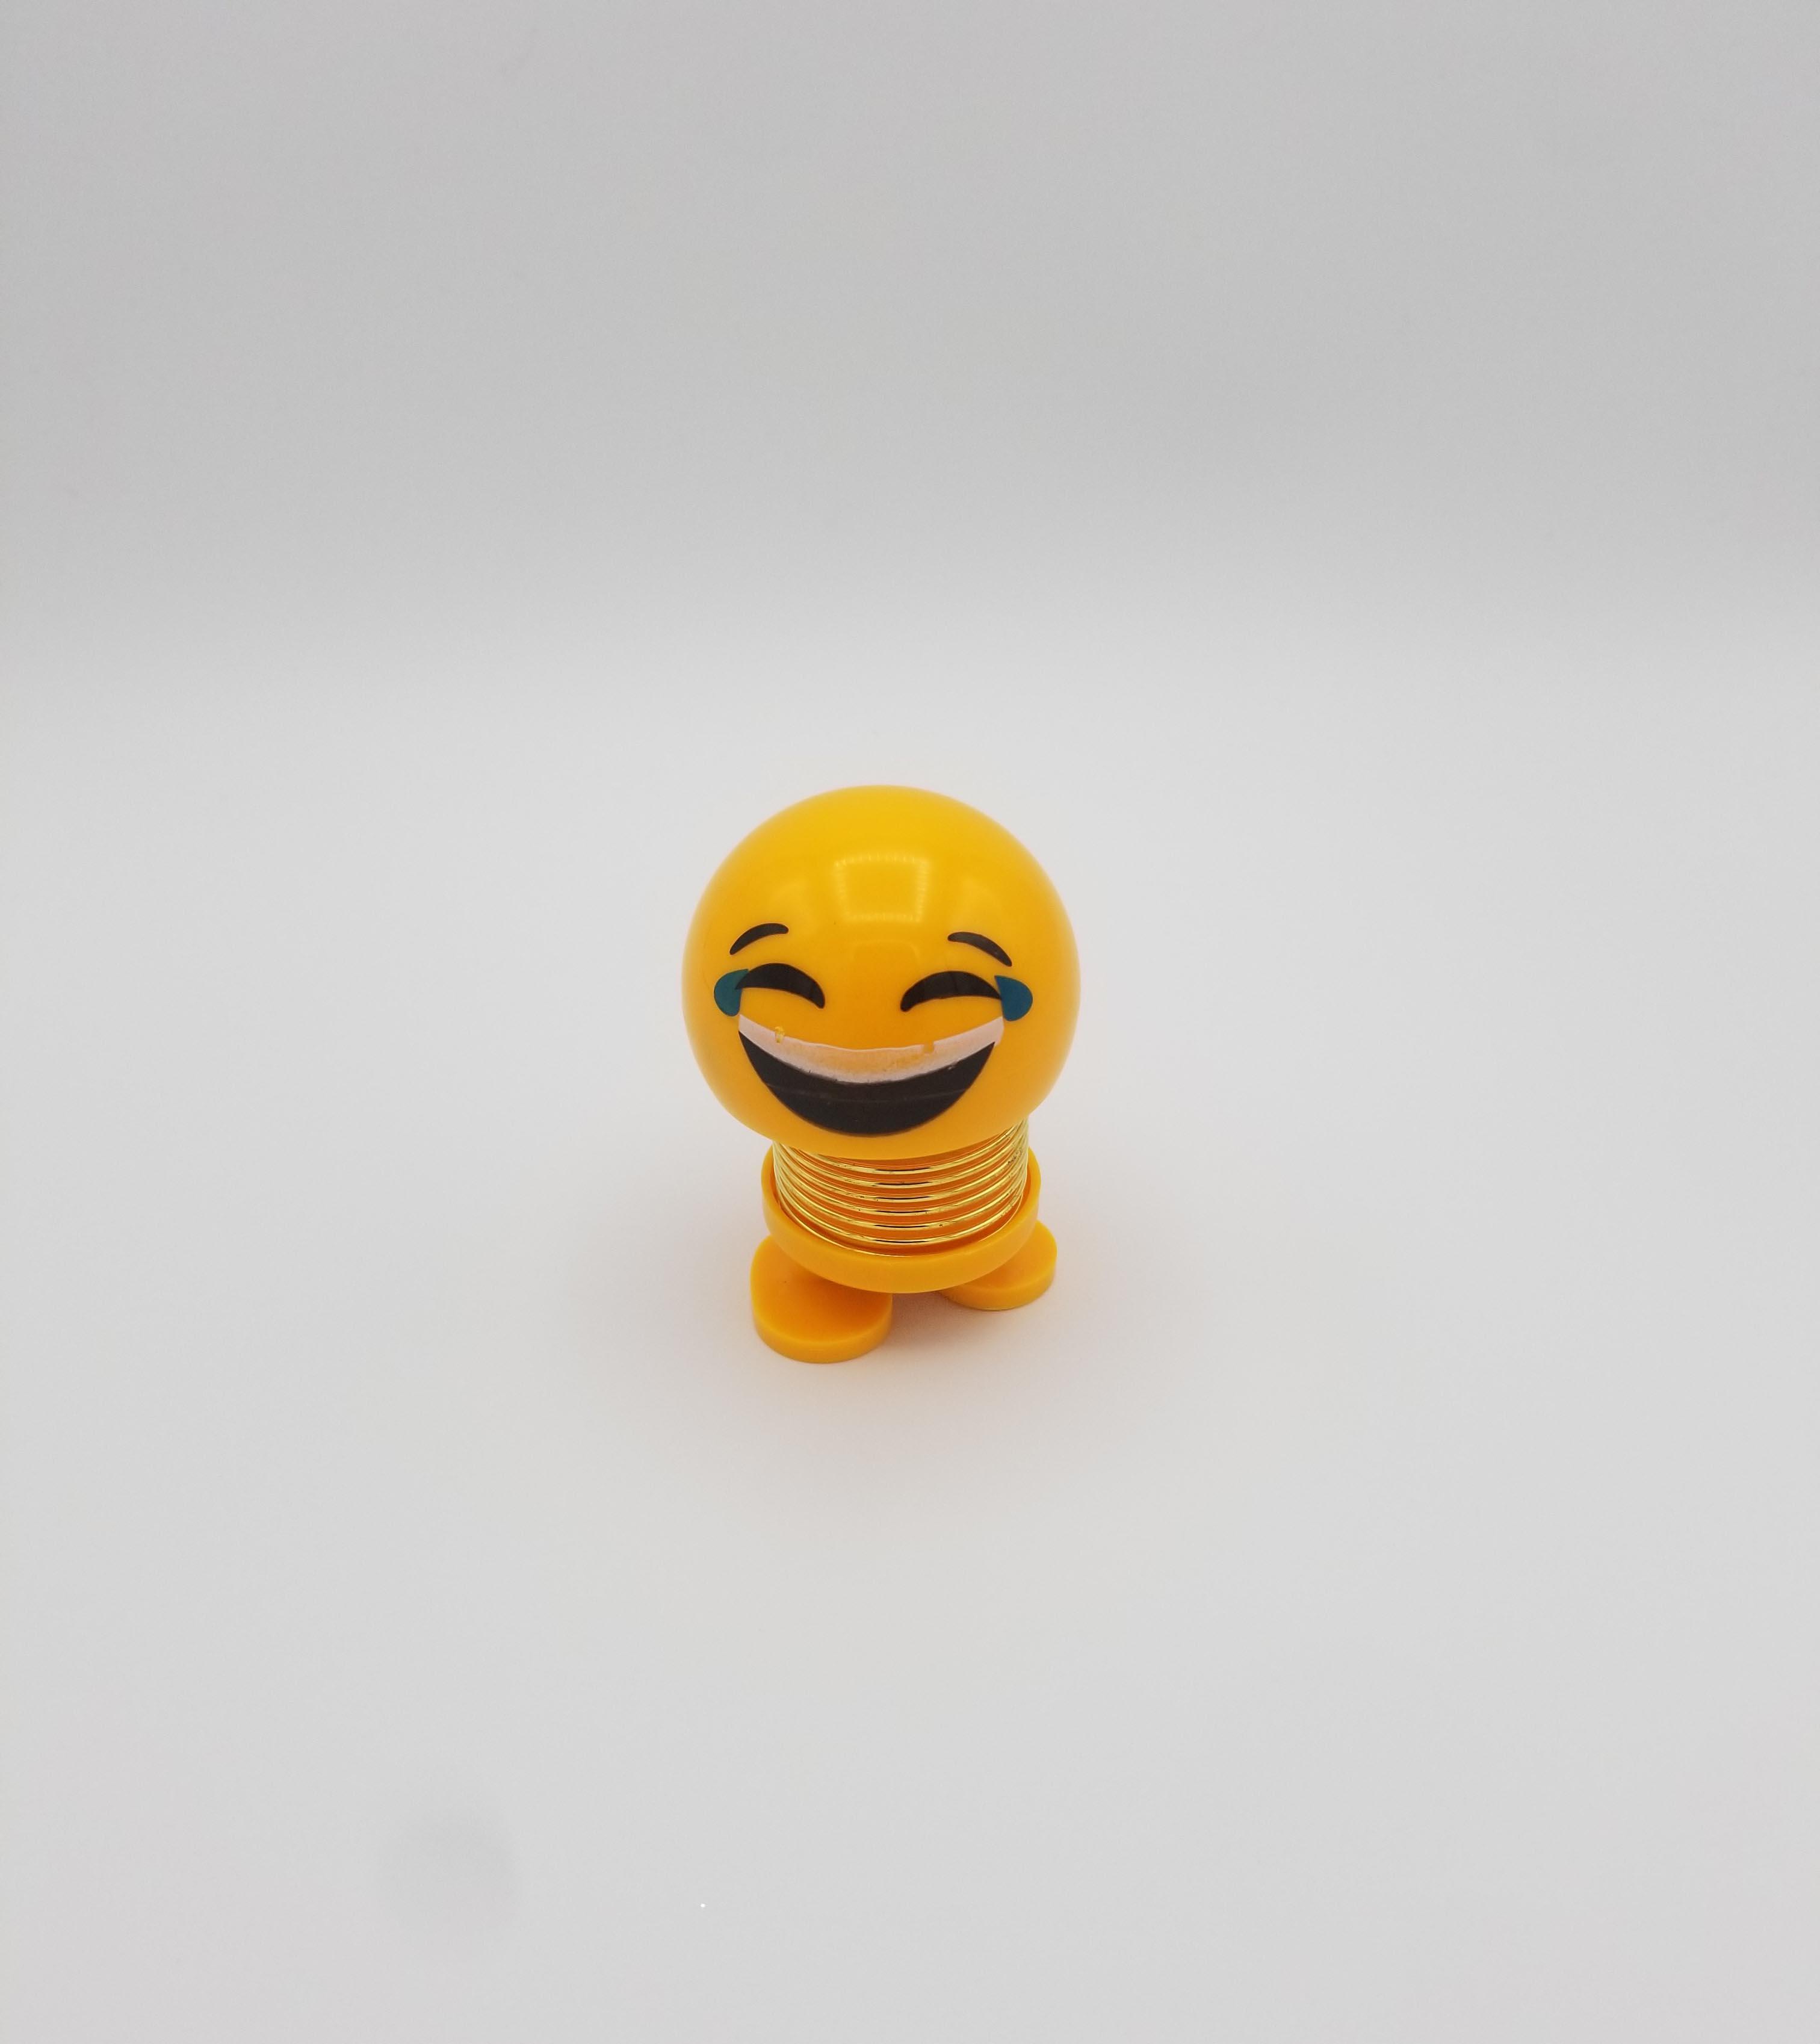 Joy Emoji Spring Shaking Head Cute Bouncing Toy Faces For Car Dashboard